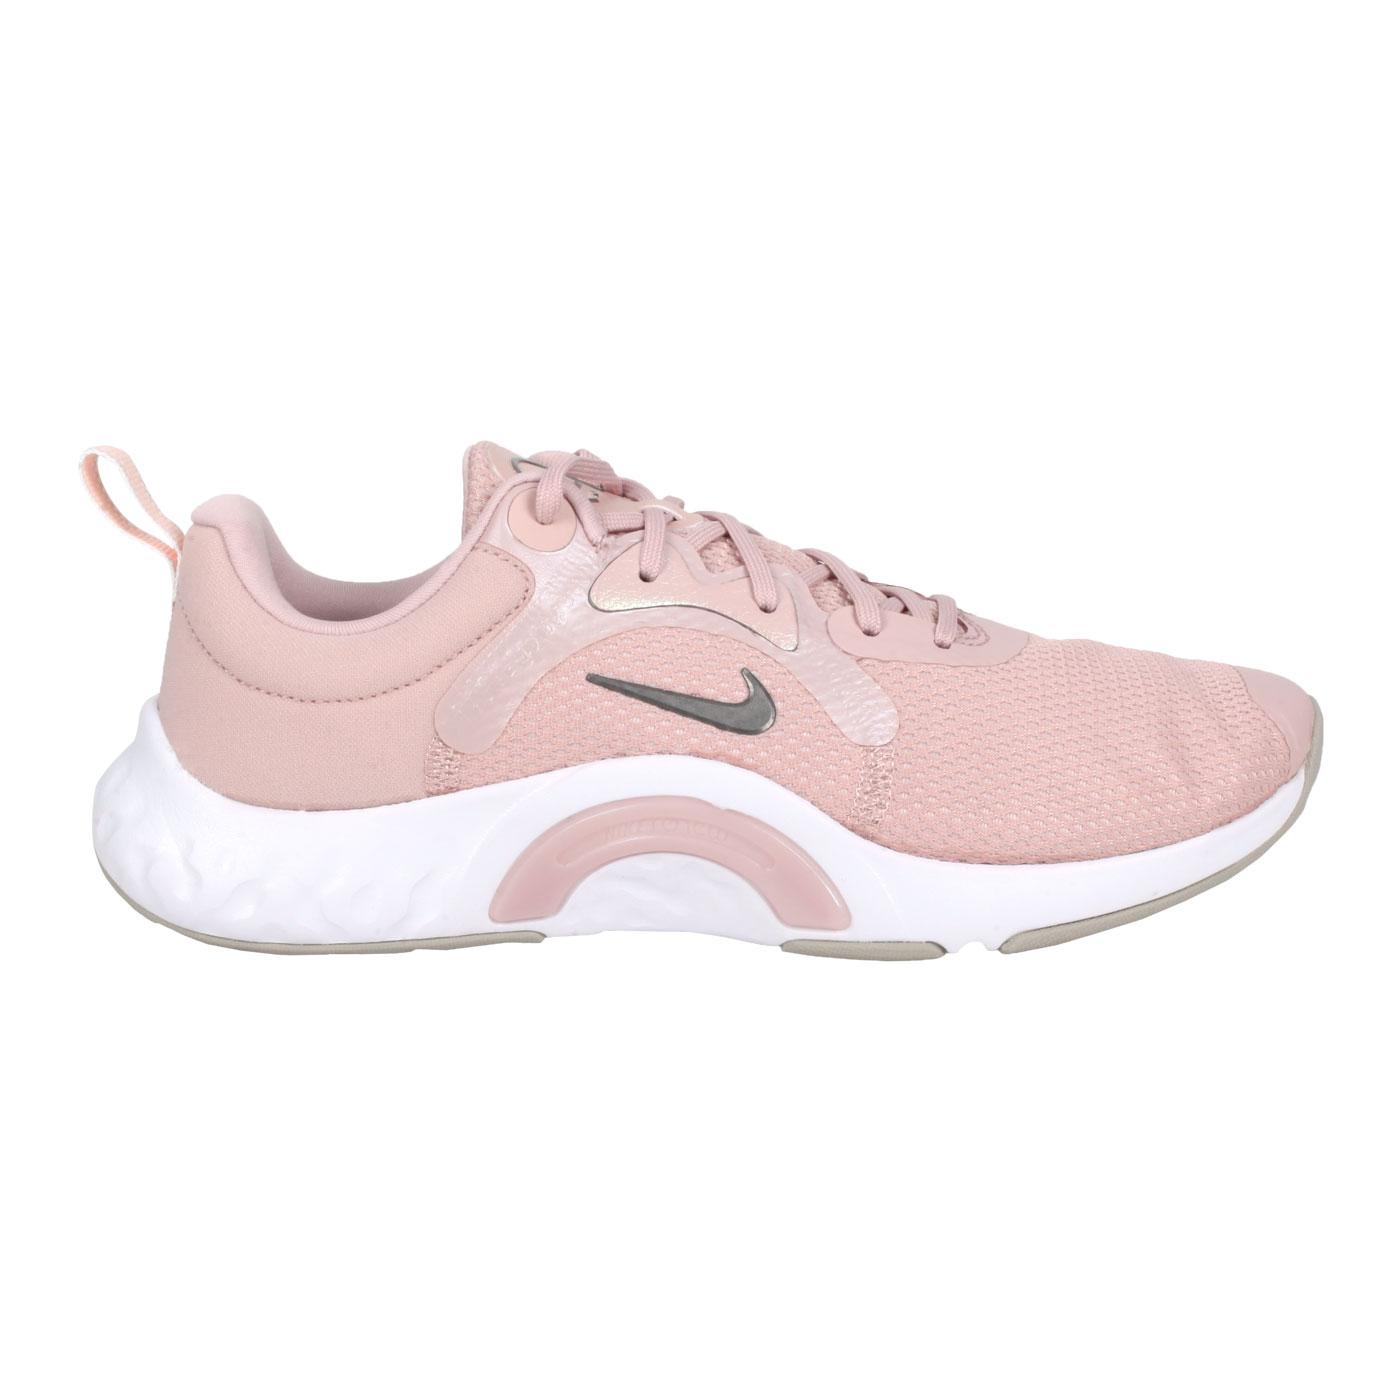 NIKE 女款休閒運動鞋  @W RENEW IN-SEASON TR 11 W@DN5116600 - 粉紅黑